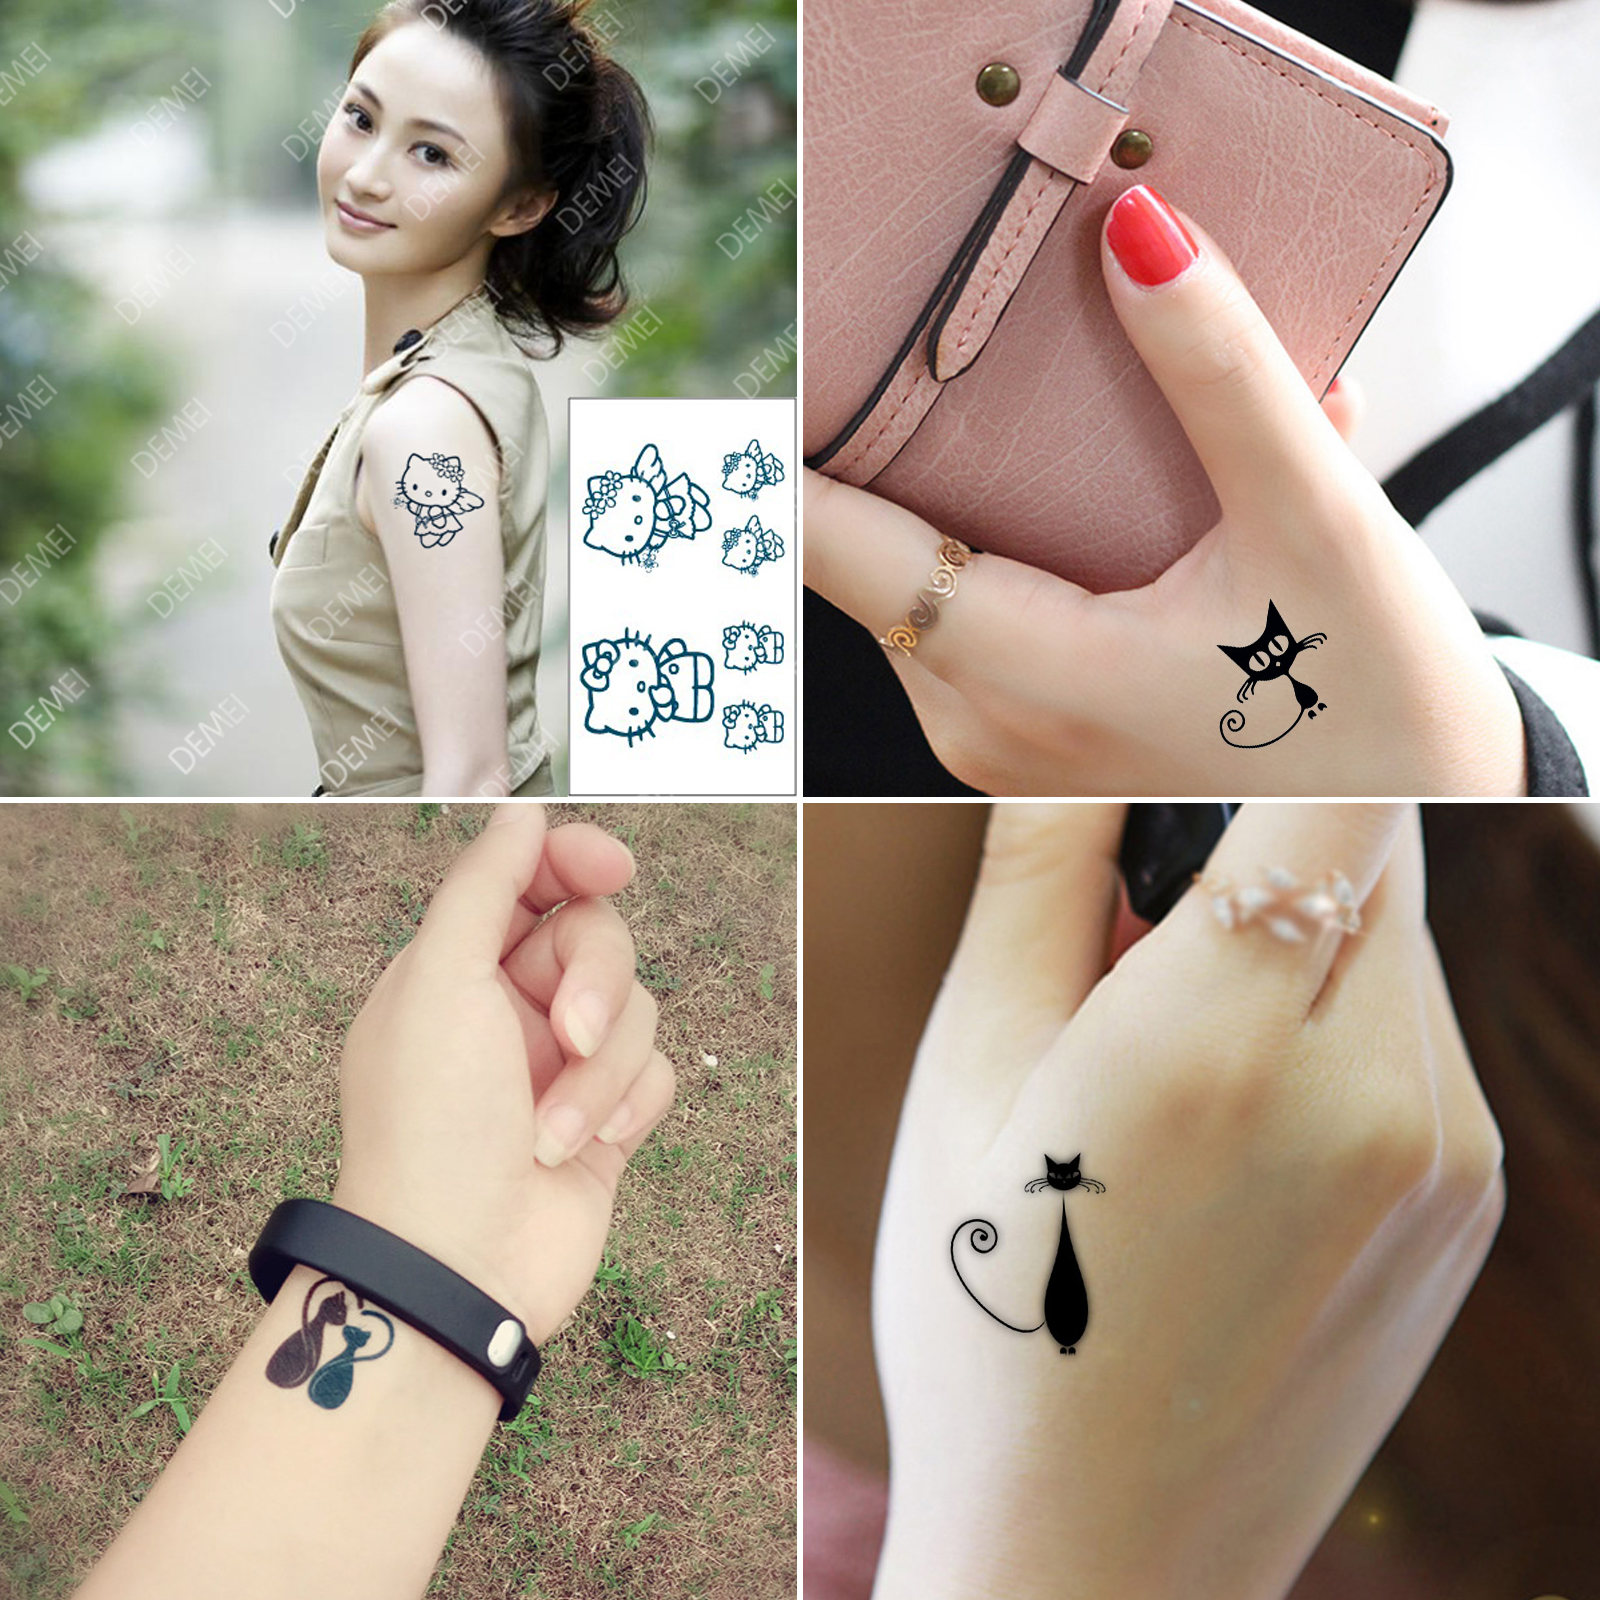 4 PCs Original Cute Lovely Cat Lover Fake Tattoo Waterproof Temporary Arm Tatoo Stickers For Women Men Body Art Tattoos